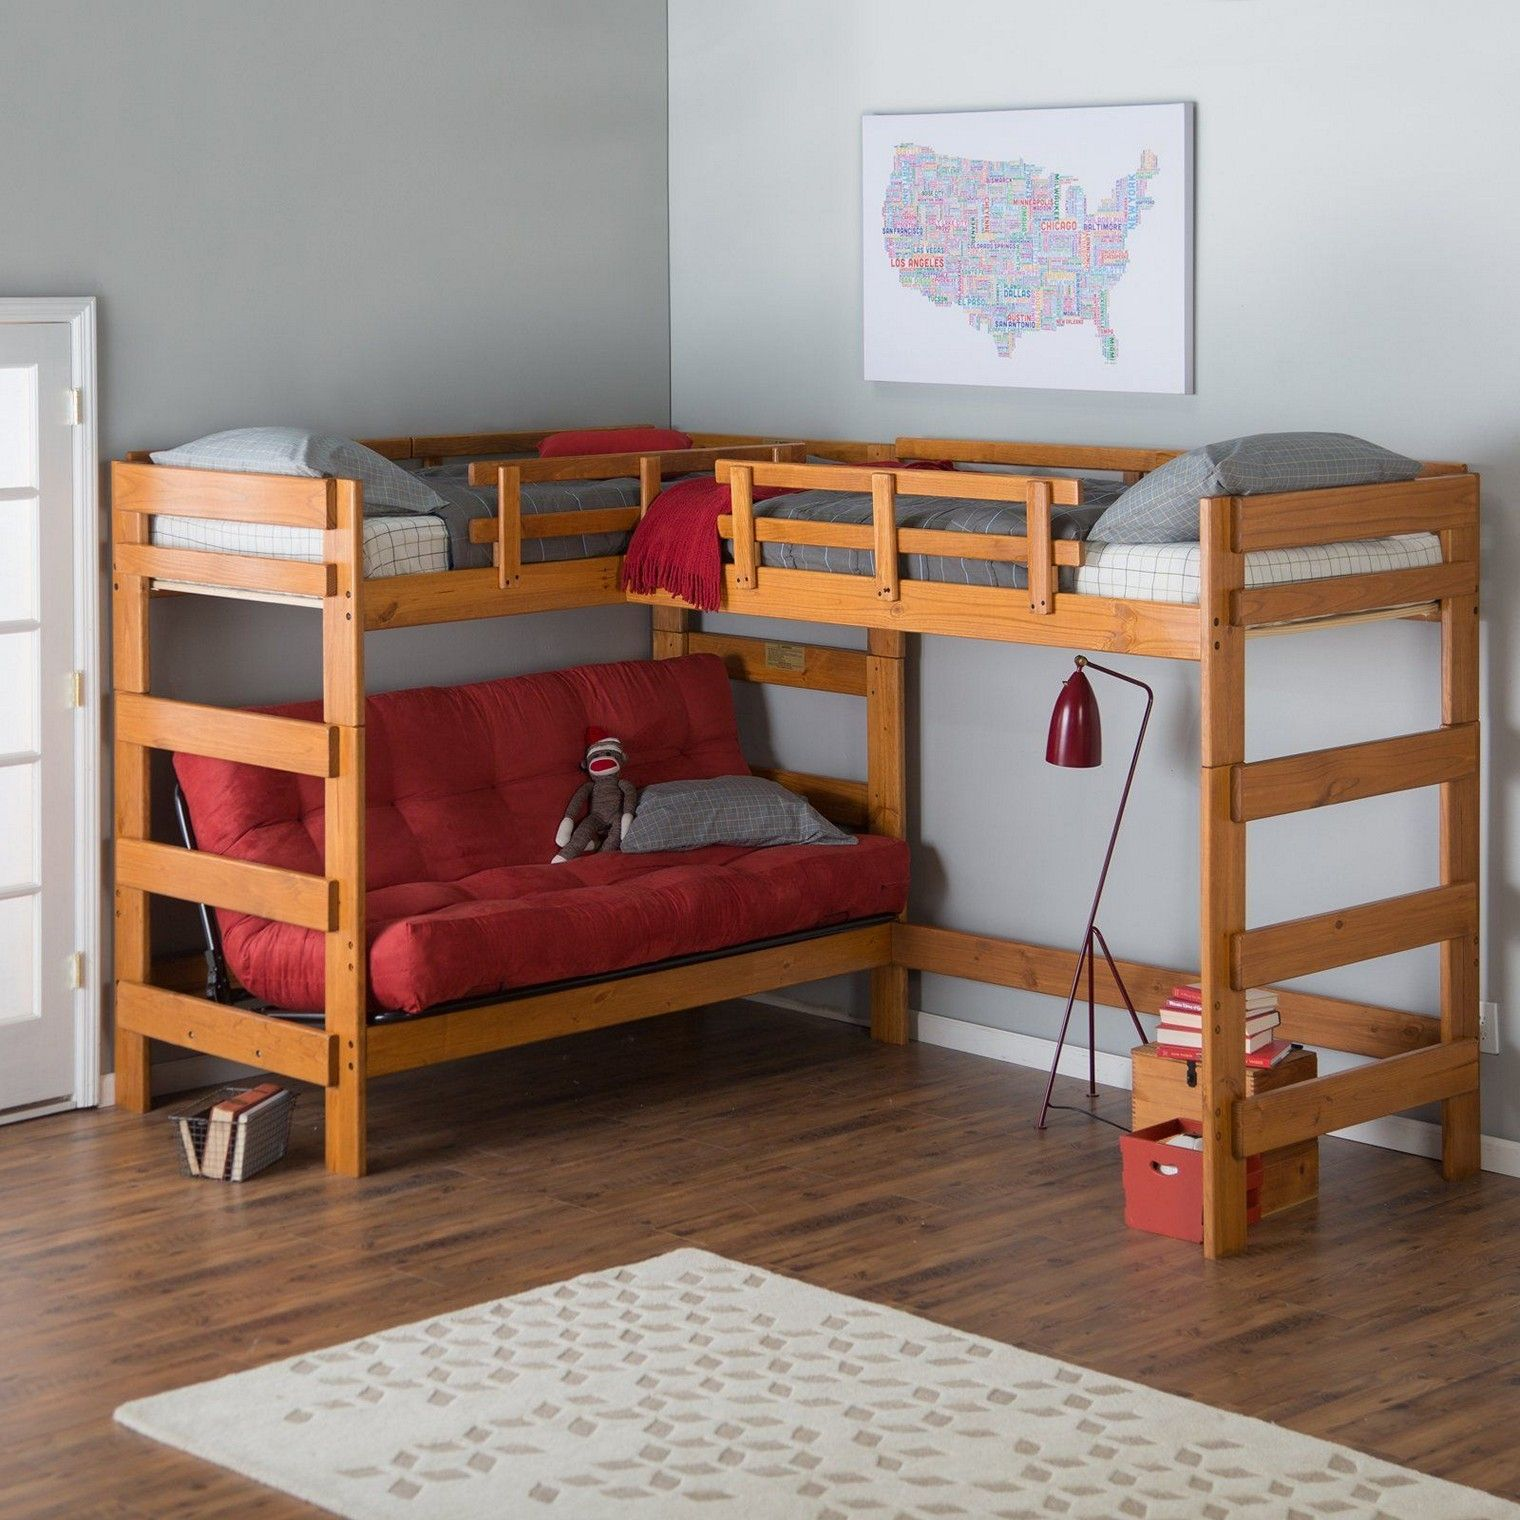 hochbett ideen schlafzimmer komplett kinder 39 s zimmer hochbett bett und schlafzimmer. Black Bedroom Furniture Sets. Home Design Ideas